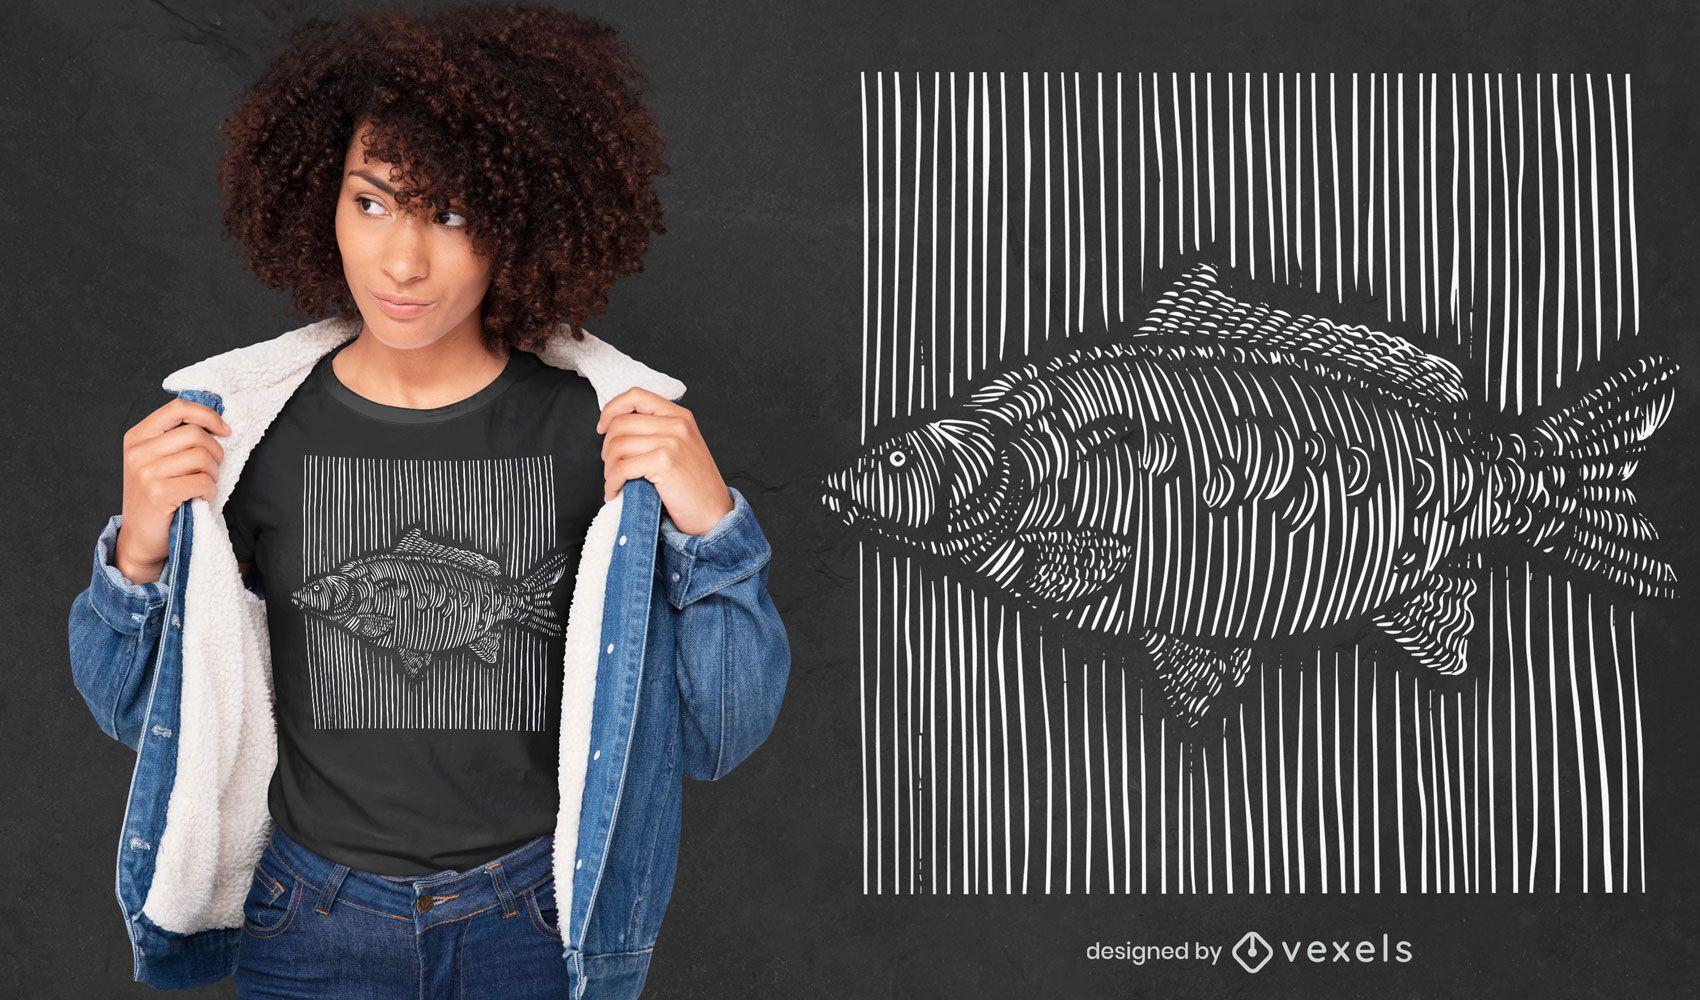 Dise?o de camiseta de pez carpa de l?neas 3D.